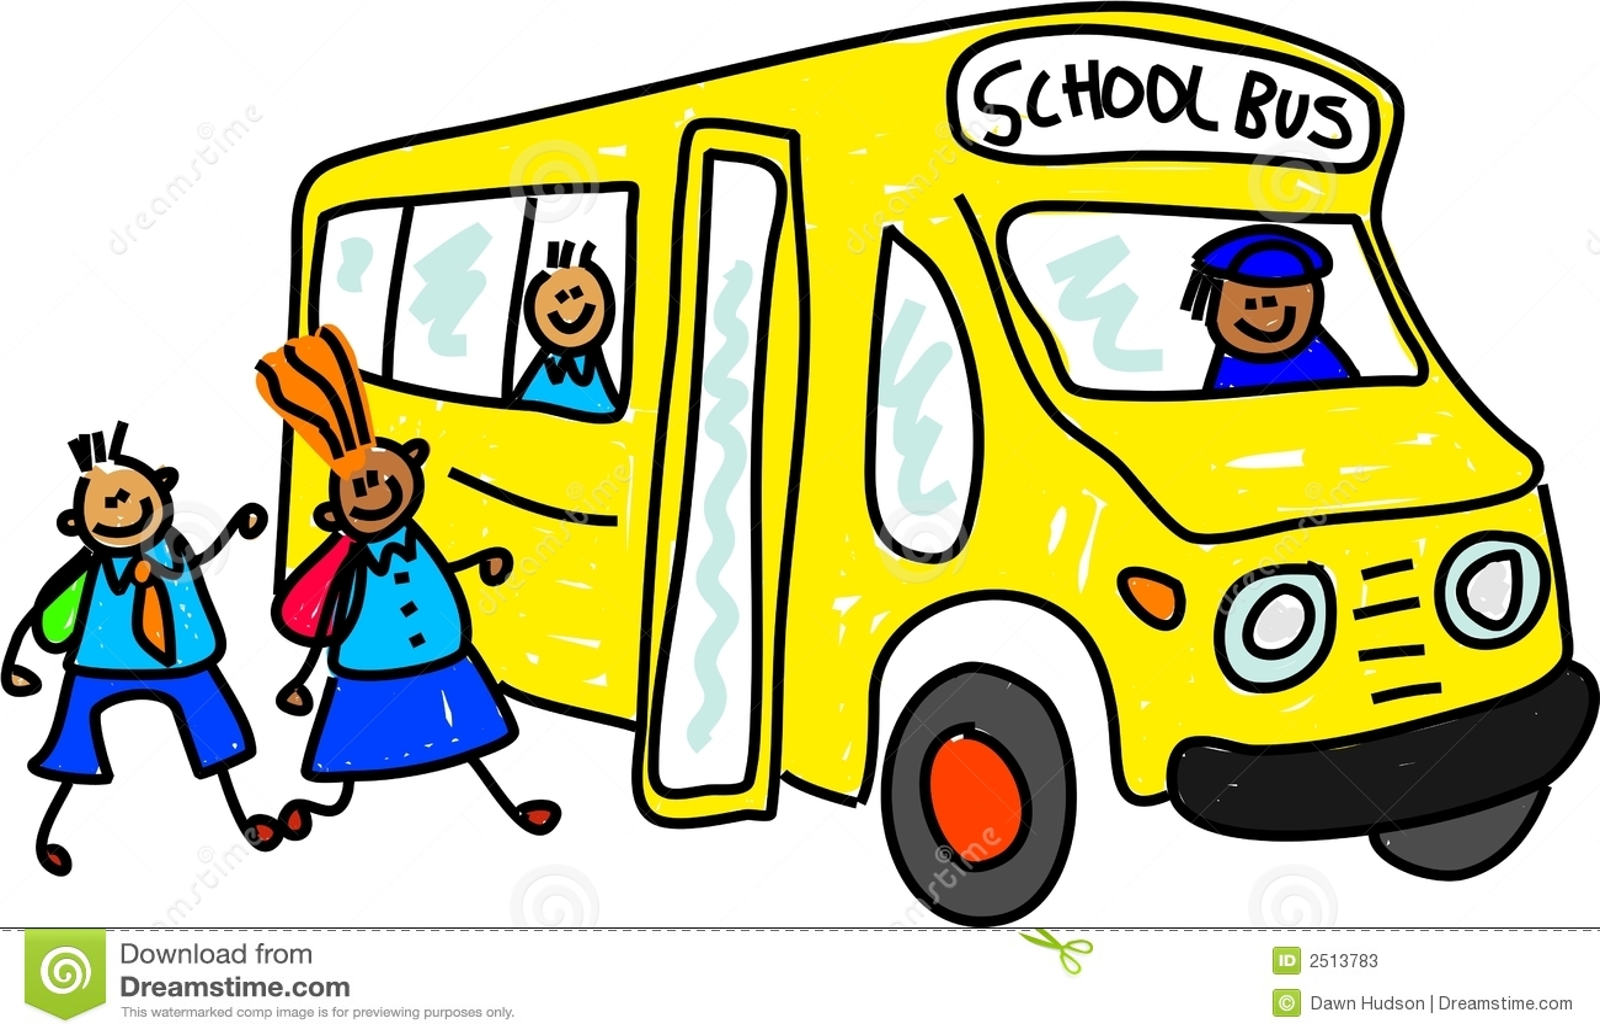 school bus stock illustration illustration of clipart 2513783 rh dreamstime com school bus clip art images Bus Clip Art Black and White School